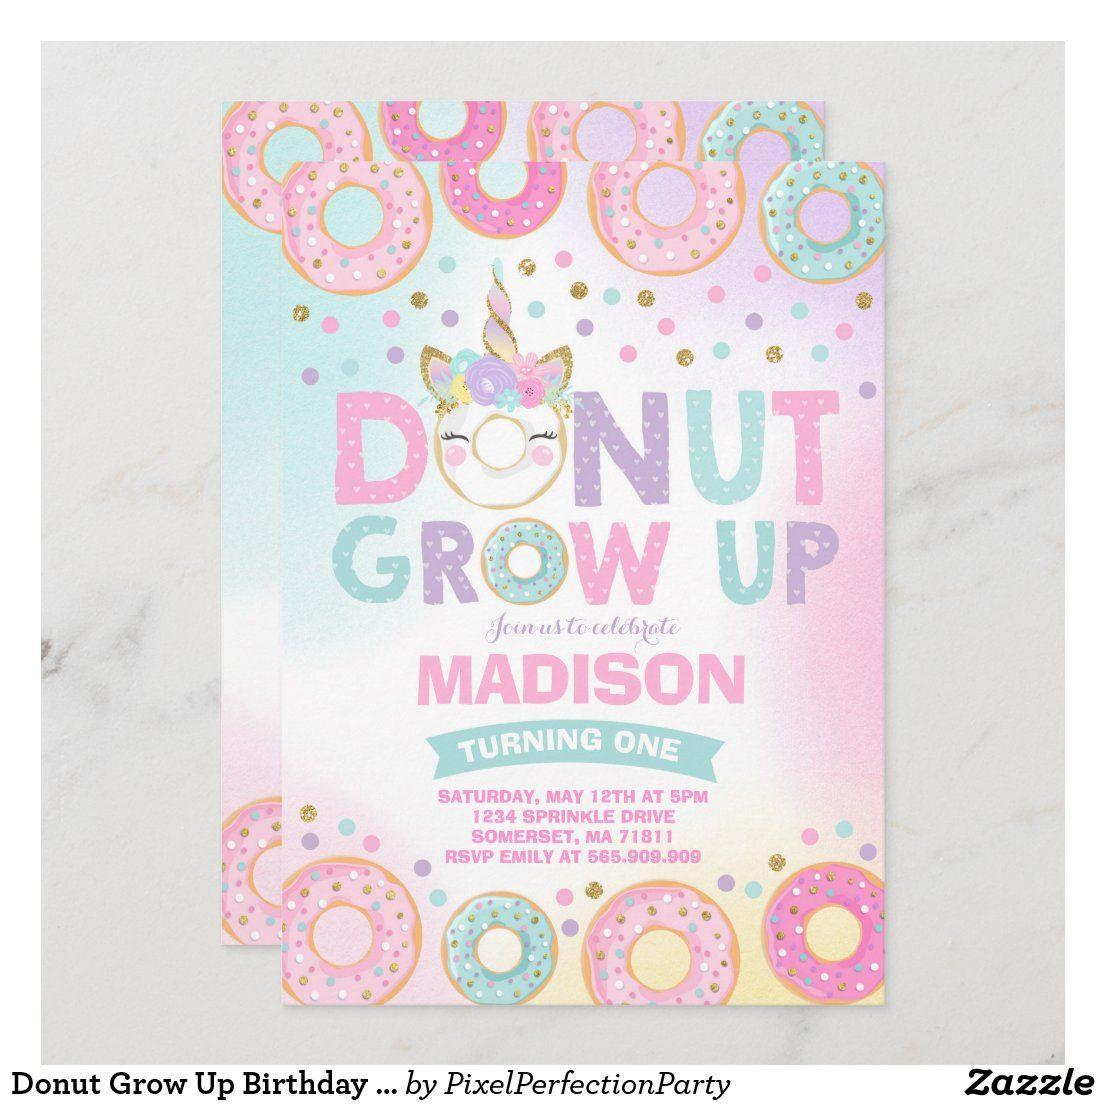 Donut Grow Up Birthday Invitation Donut Unicorn Zazzle Com In 2021 Donut Themed Birthday Party Donut Birthday Parties Birthday Invitations